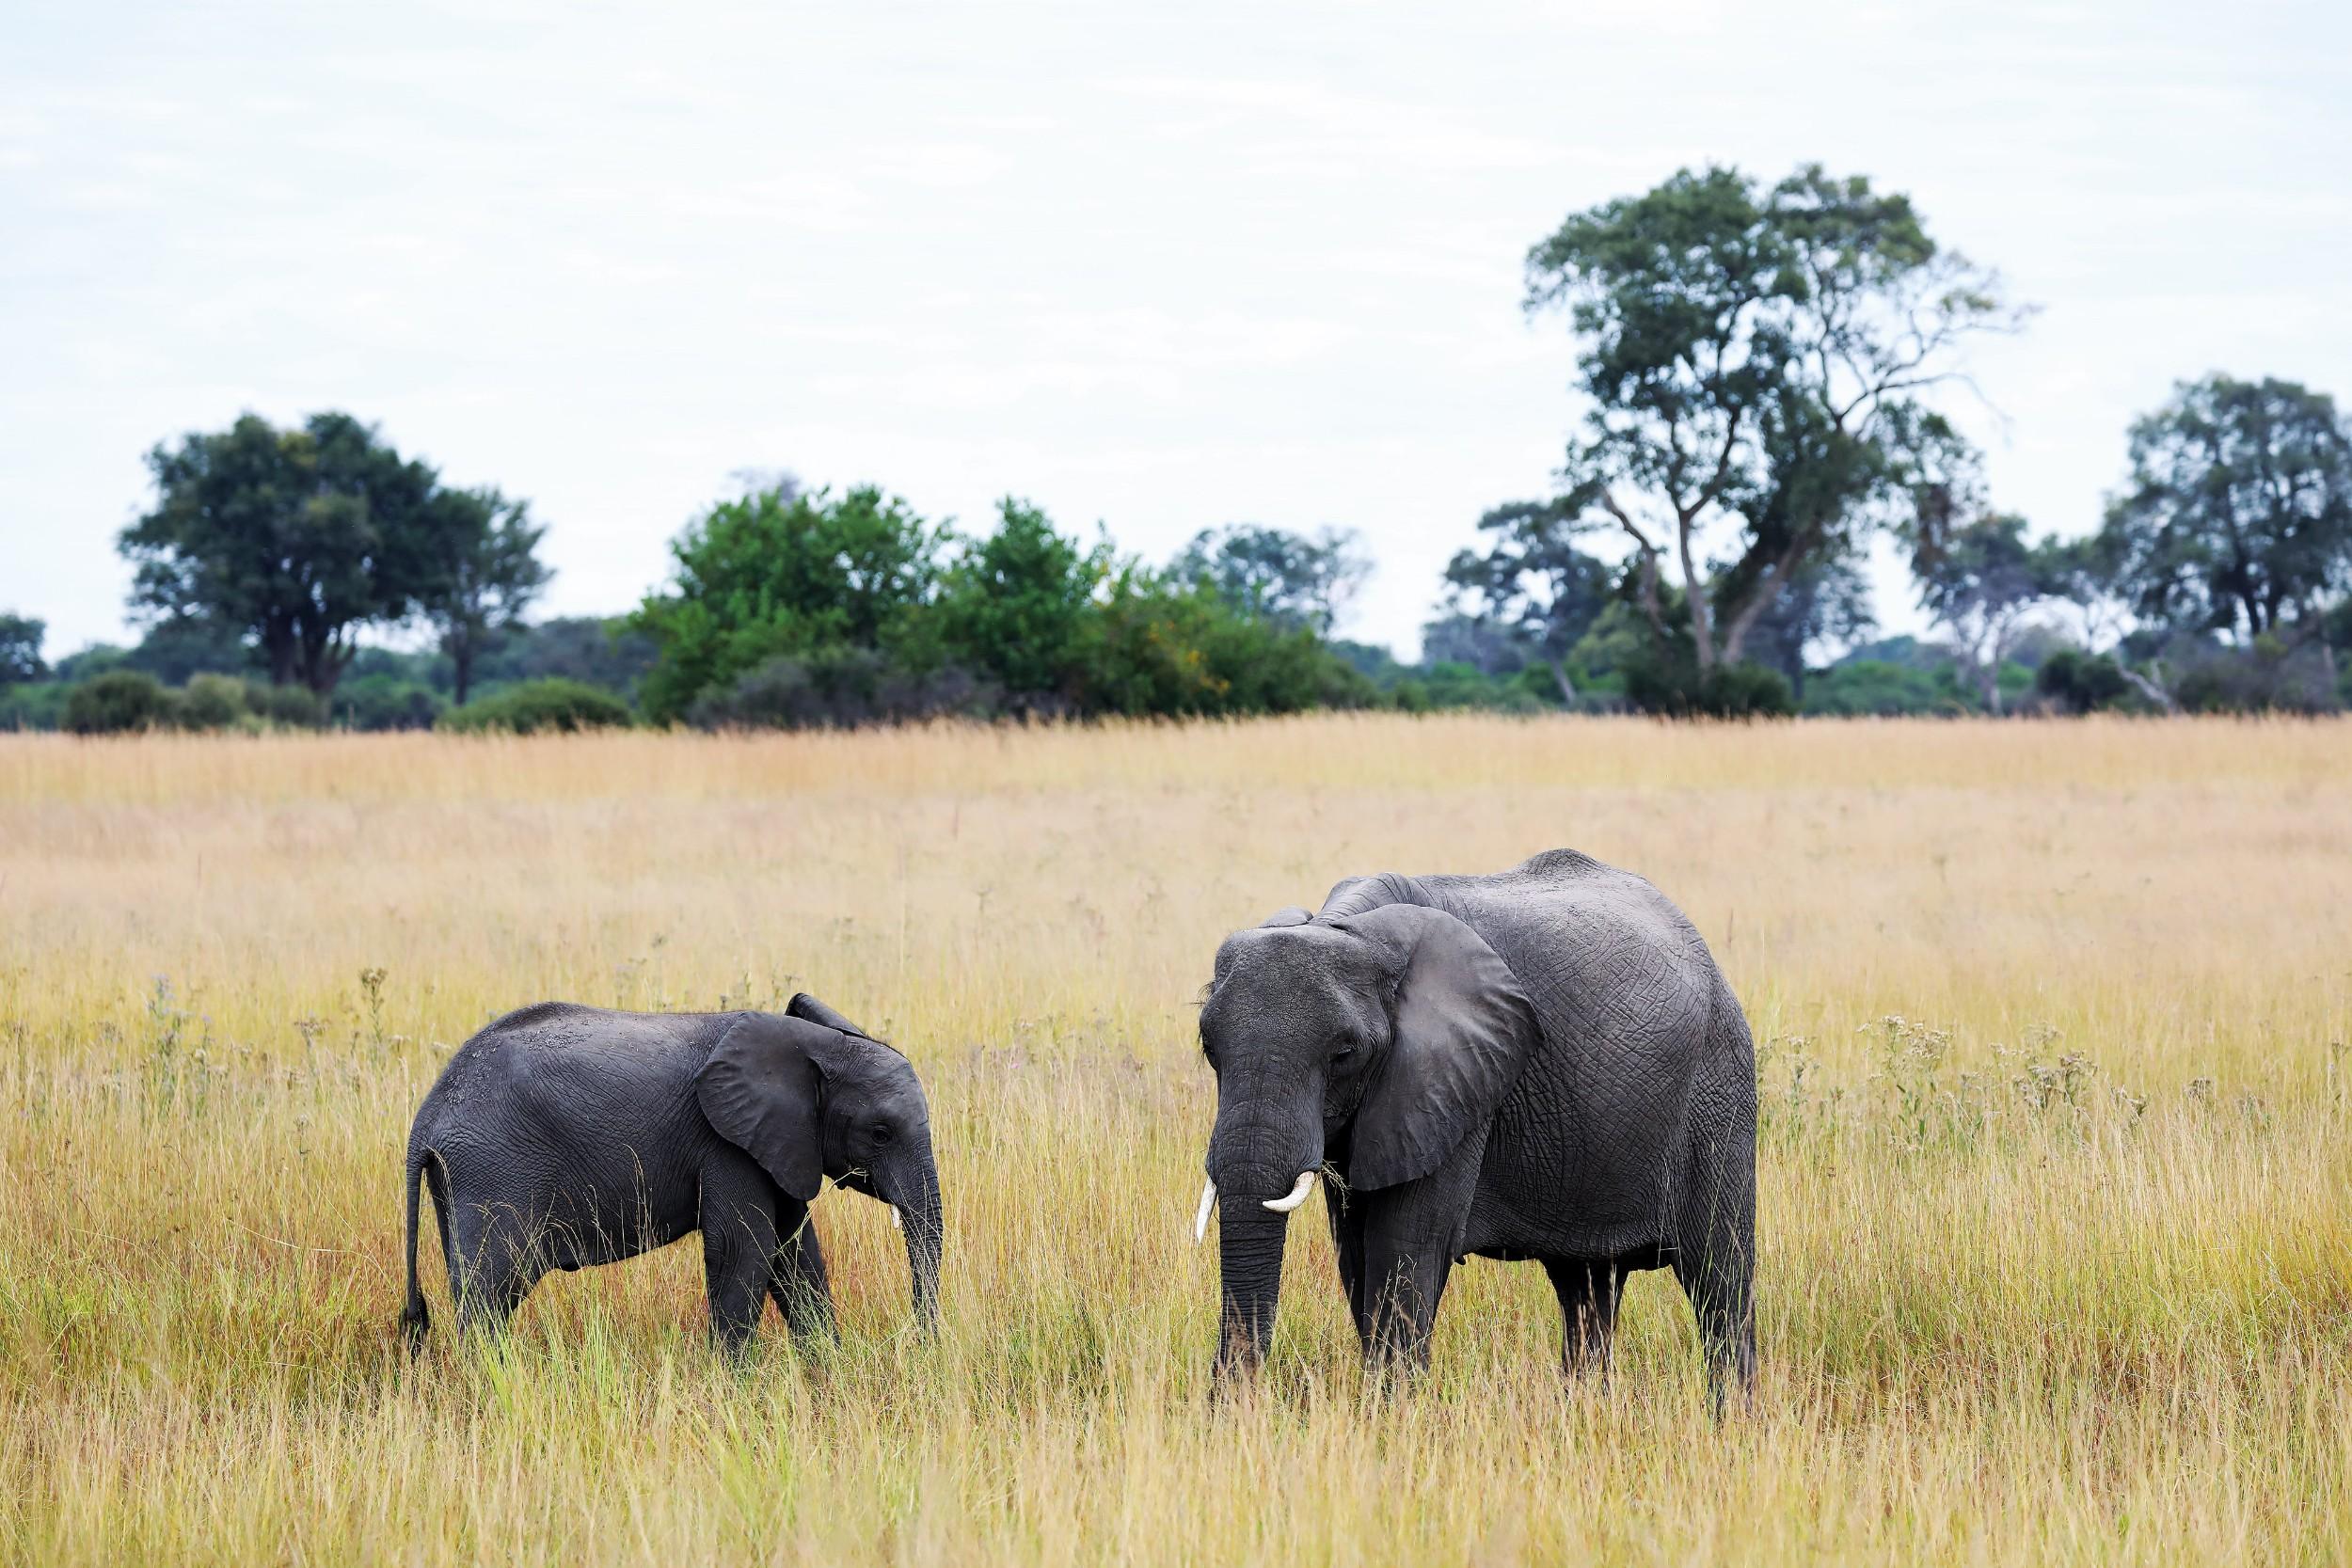 19The Jackal and Hide - Elephant mum & baby.jpg